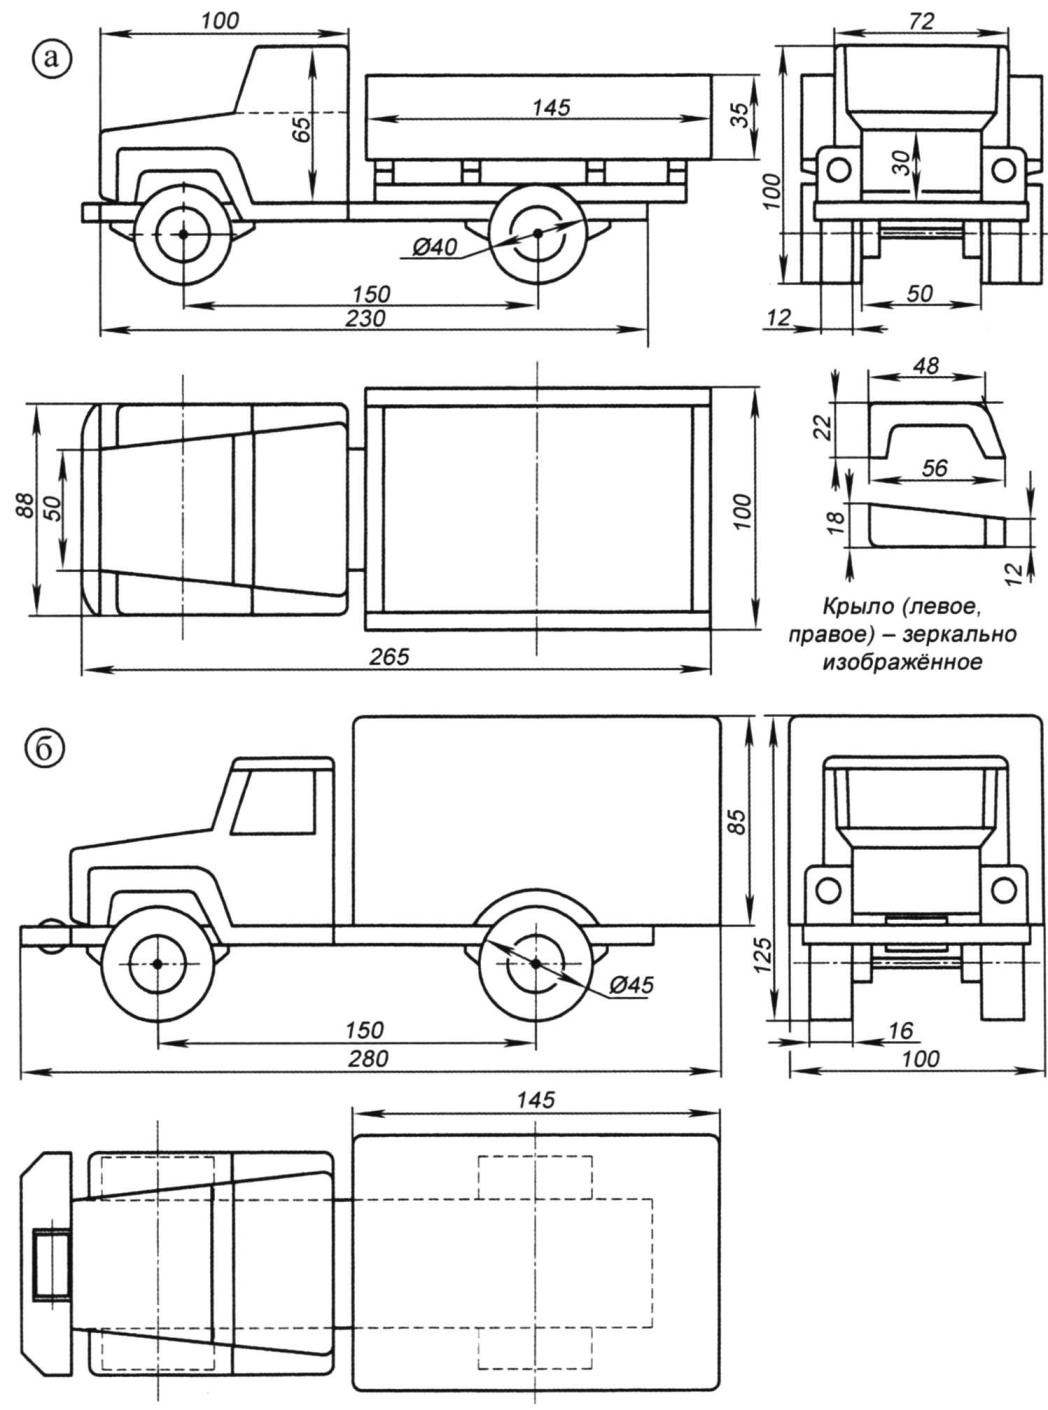 Truck Gorky automobile plant (GAZ)